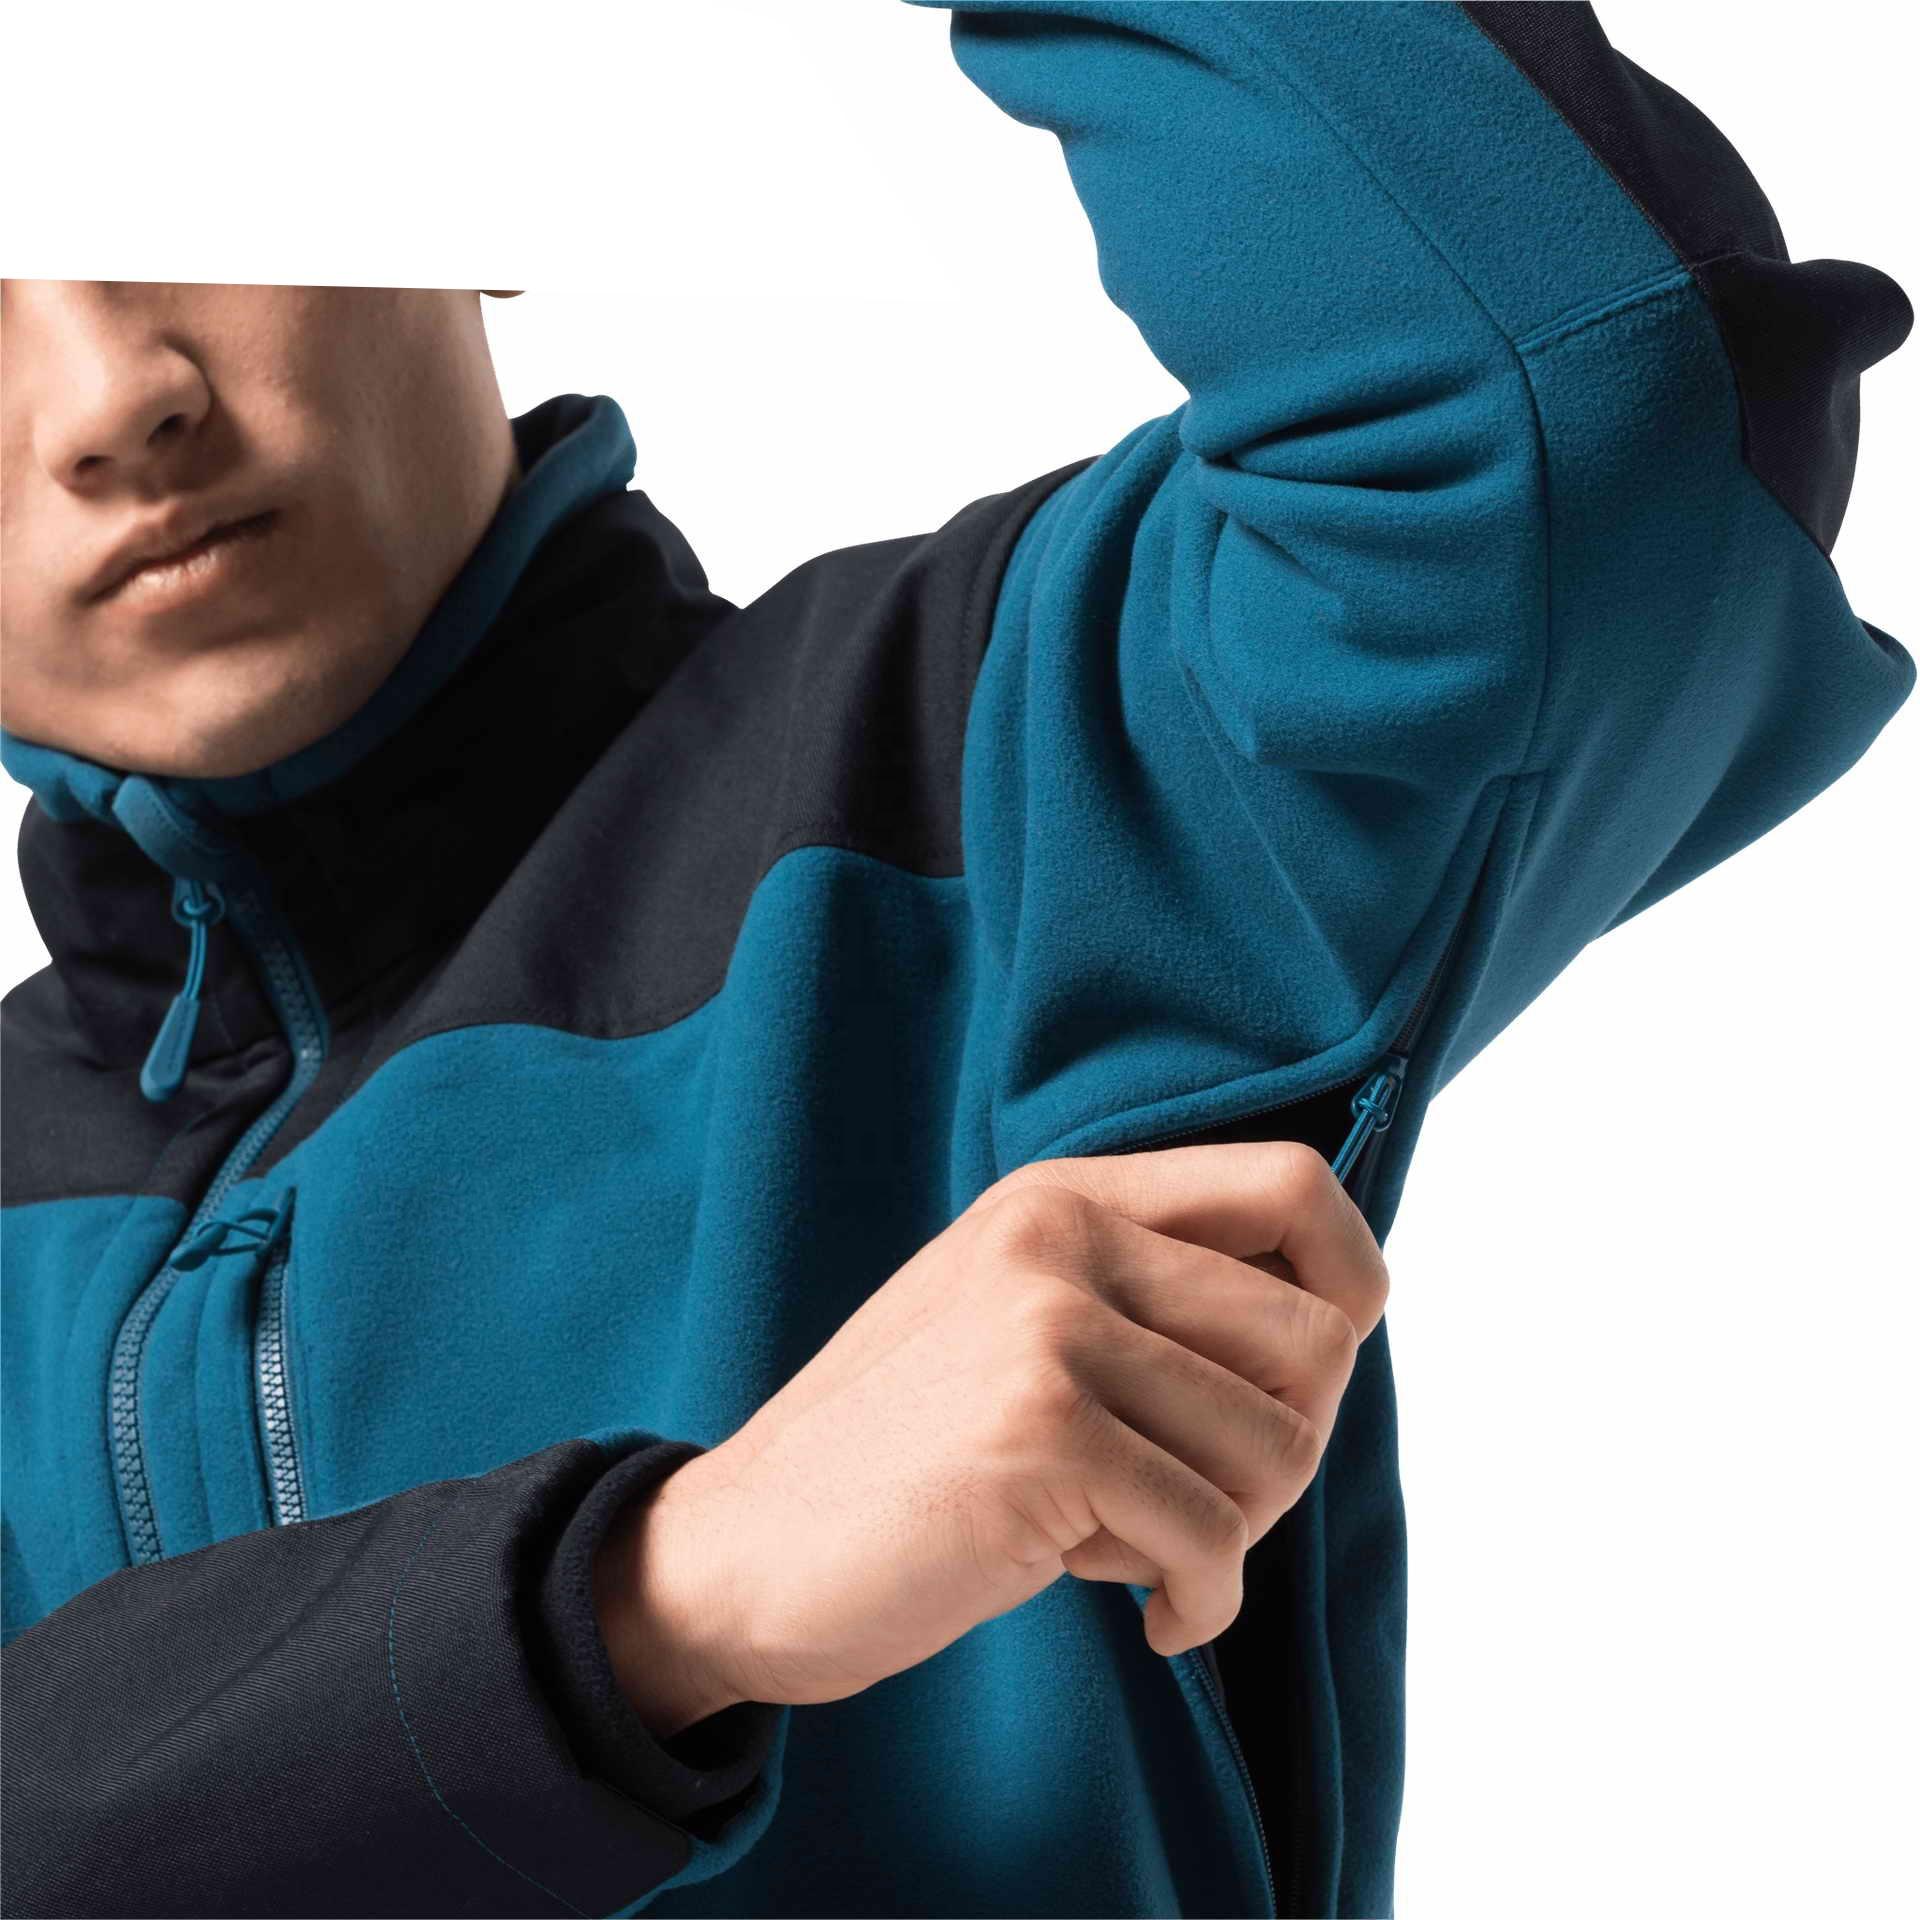 Men's winter outdoor polar fleece hiking jacket keep warm windproof in blue